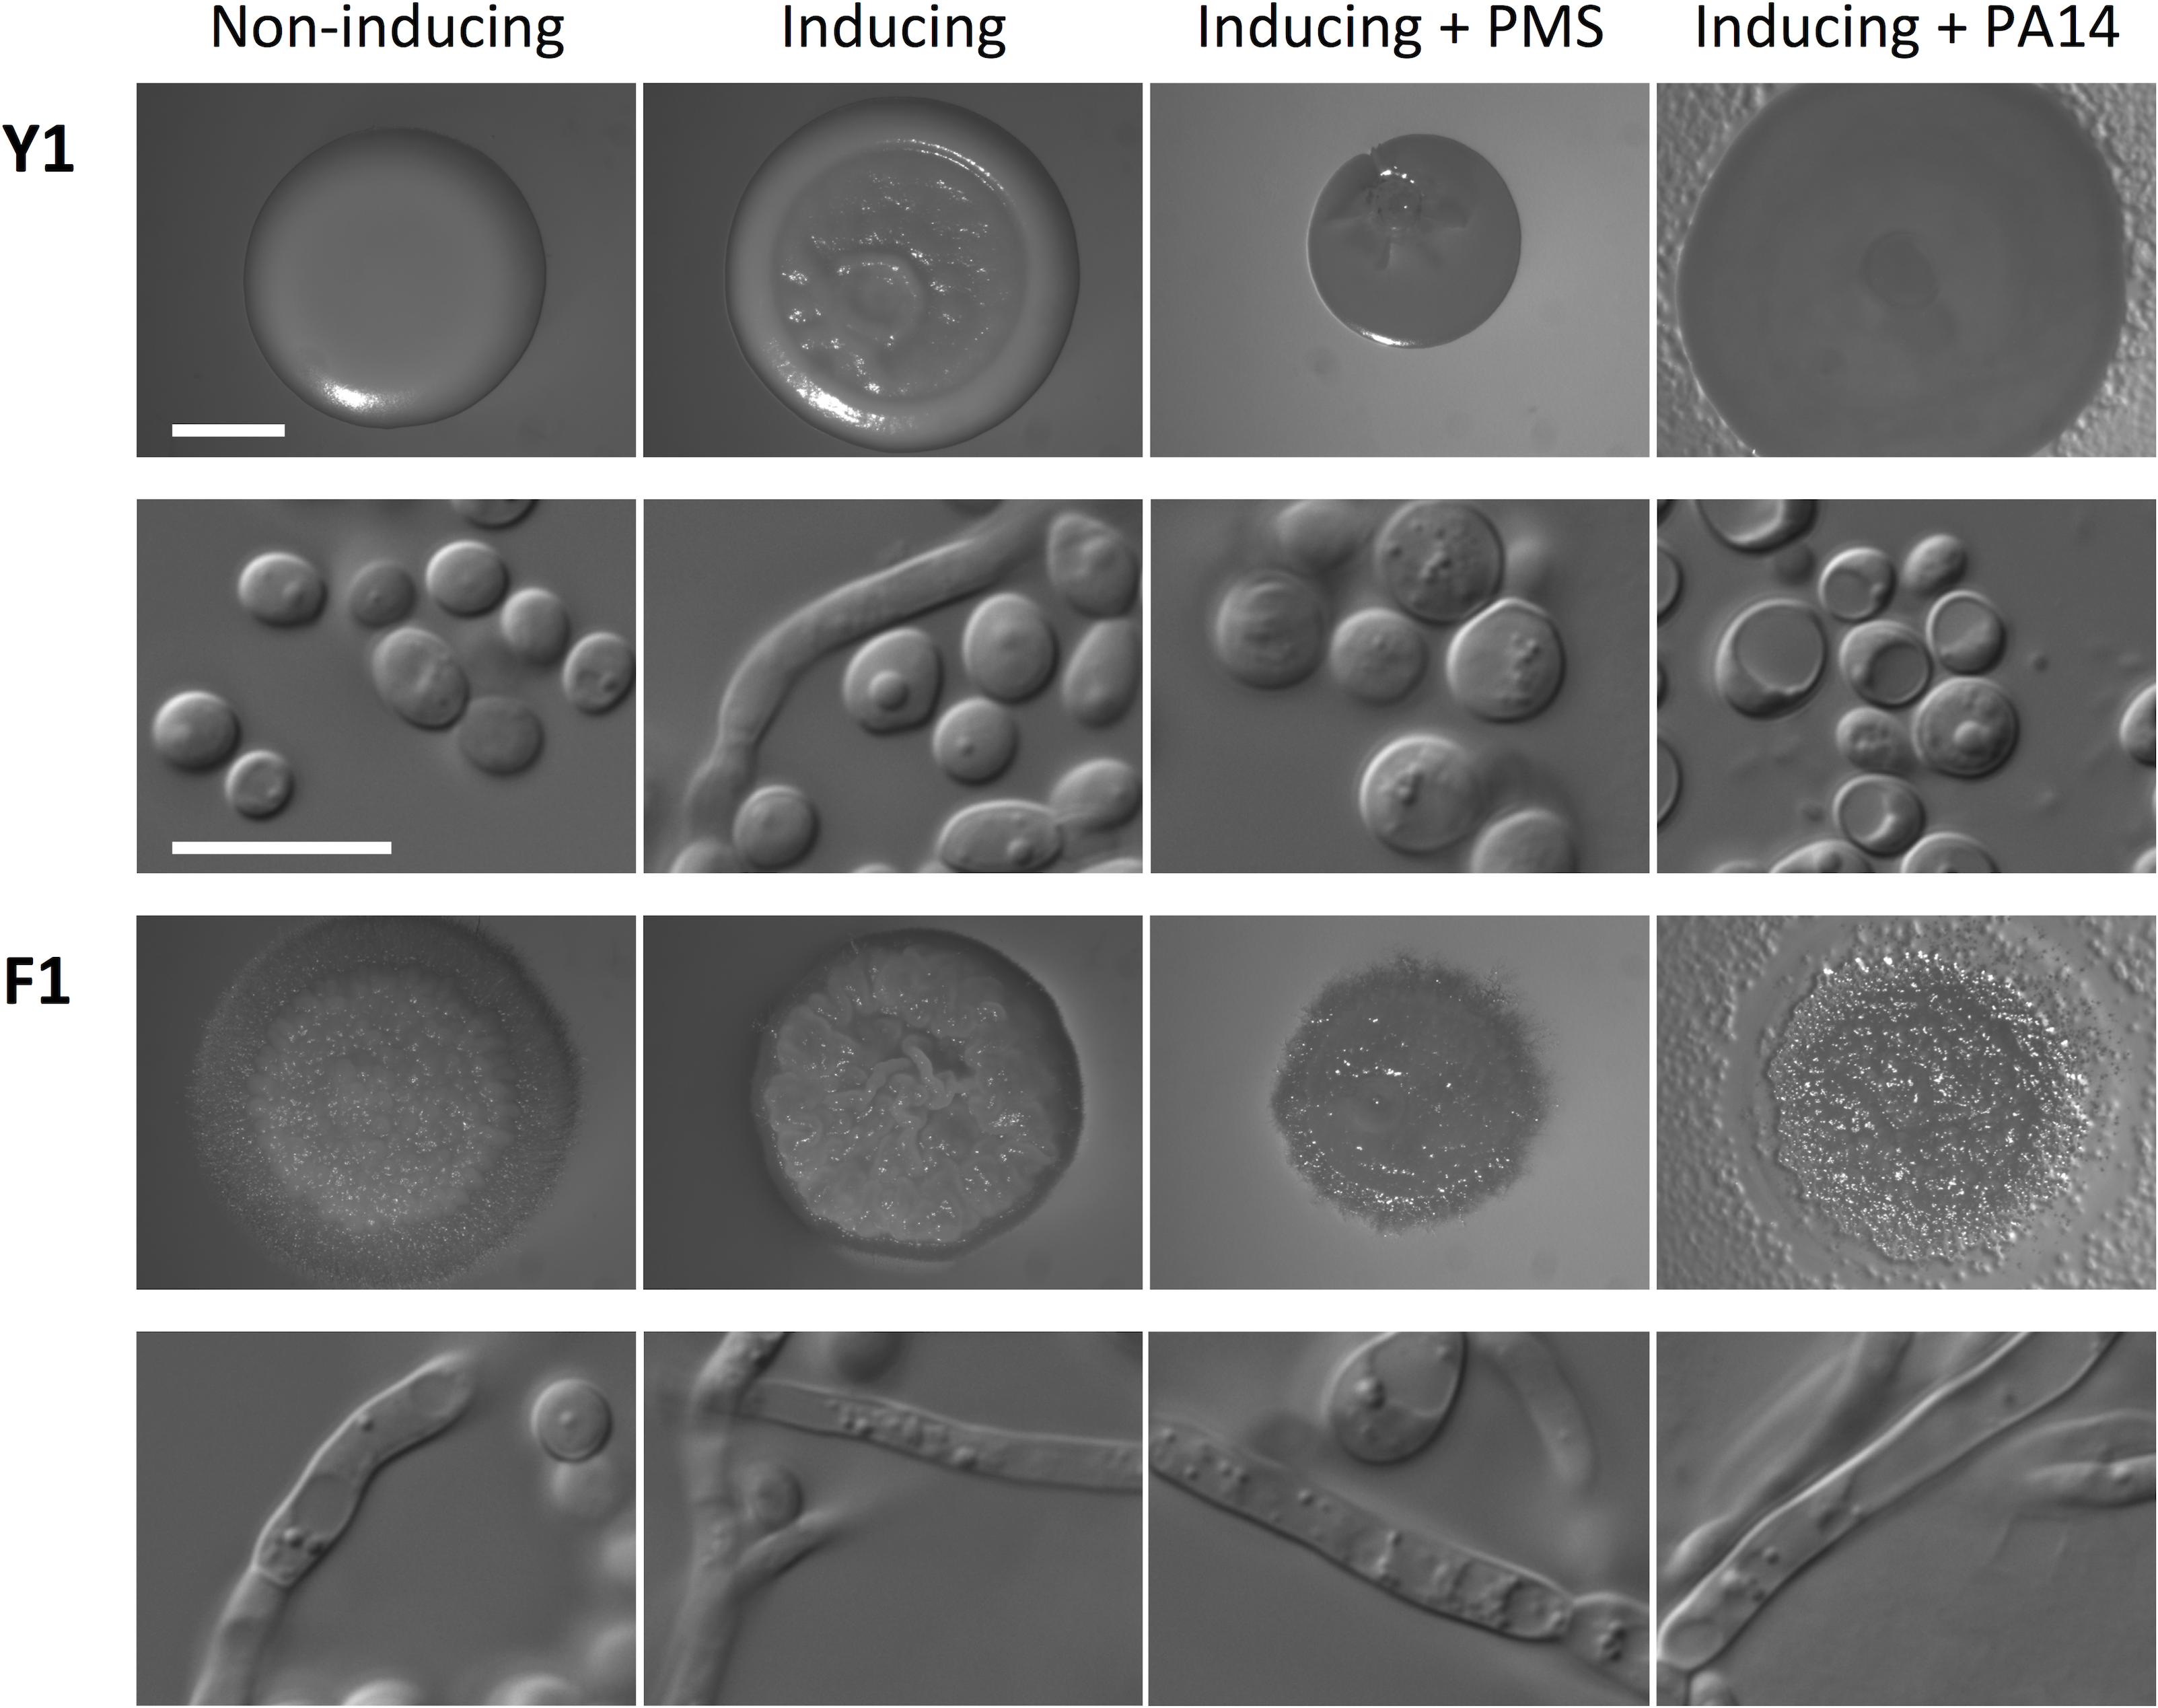 Phenazine methosulfate (PMS) or <i>P</i>. <i>aeruginosa</i> inhibits filamentation of <i>C</i>. <i>albicans</i> with standard growth morphology (Y1), but not of filamentous isolate F1.